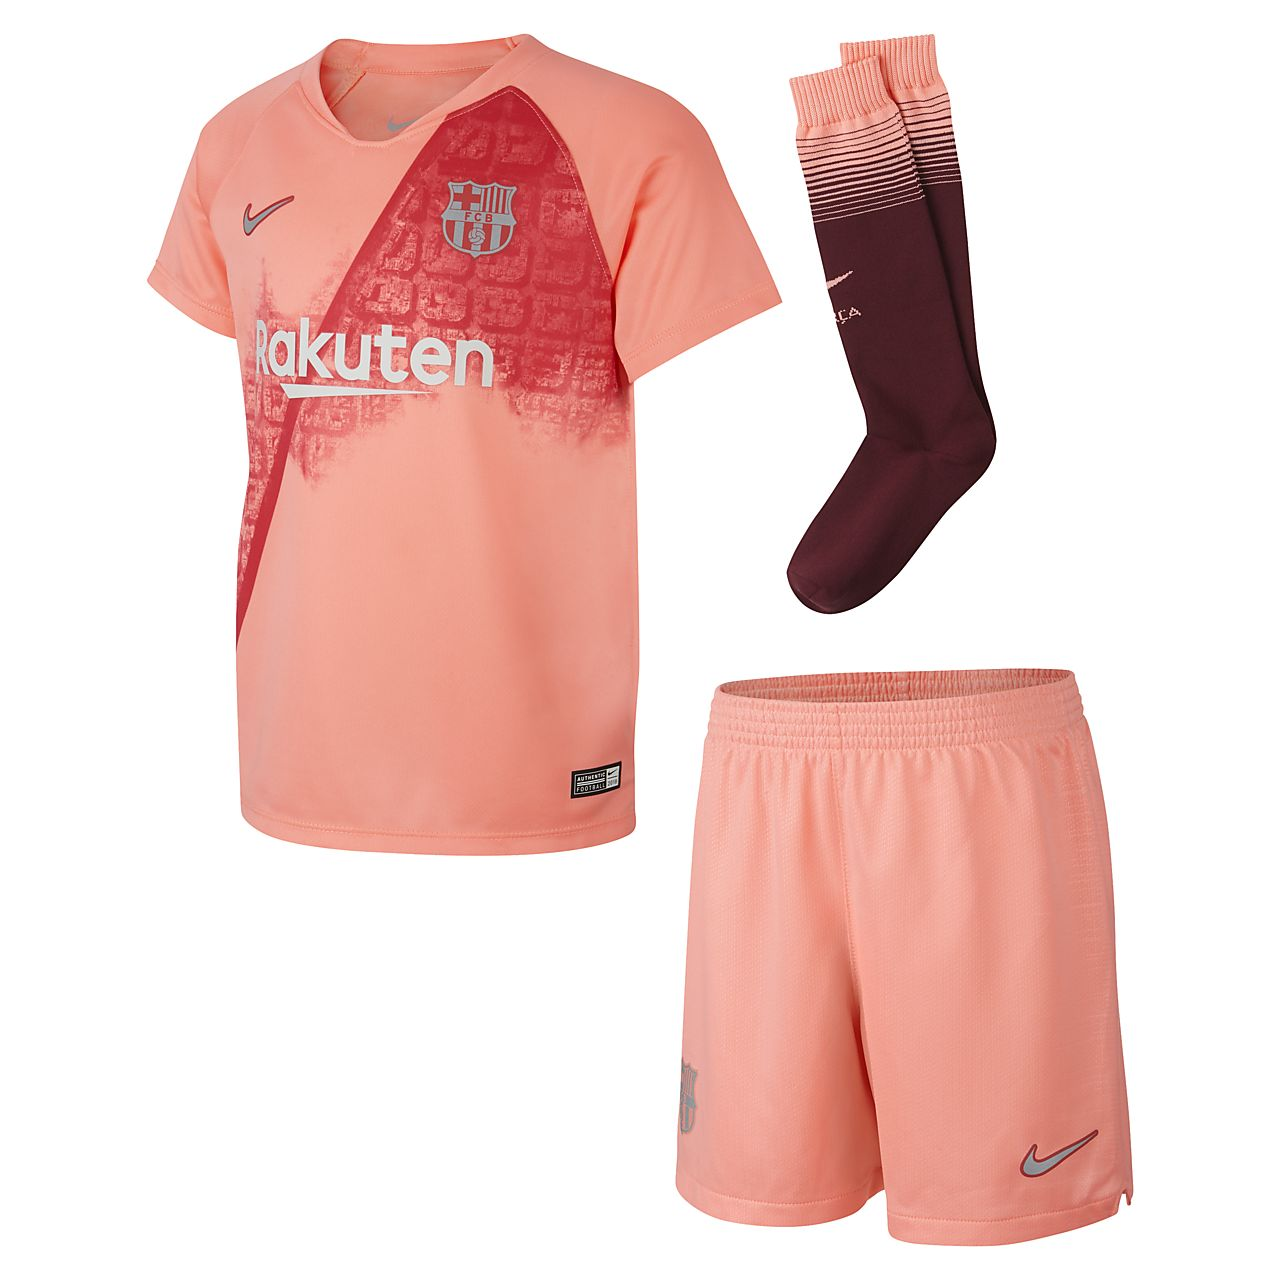 Kit de fútbol para niños talla pequeña alternativa Stadium del FC Barcelona 2018/19